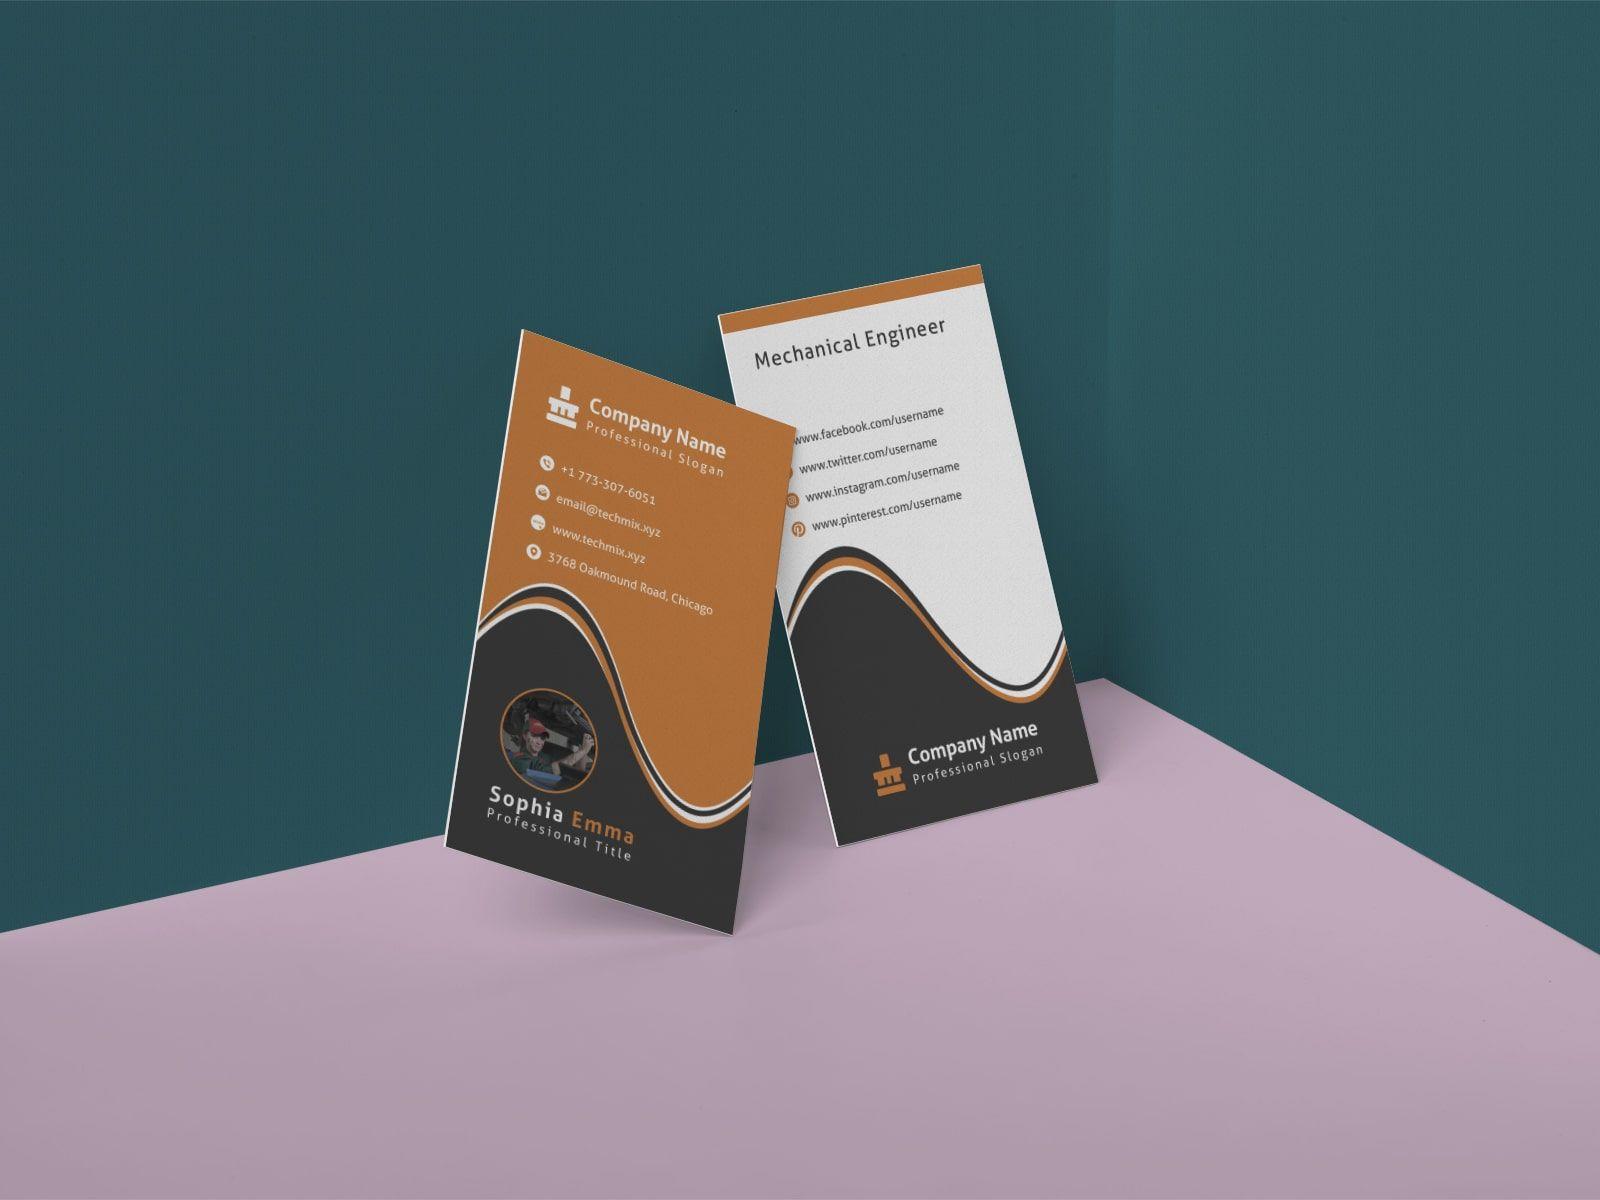 Mechanical Engineer Business Card Template Business Cards Collection Mechanical Engineering Business Card Template